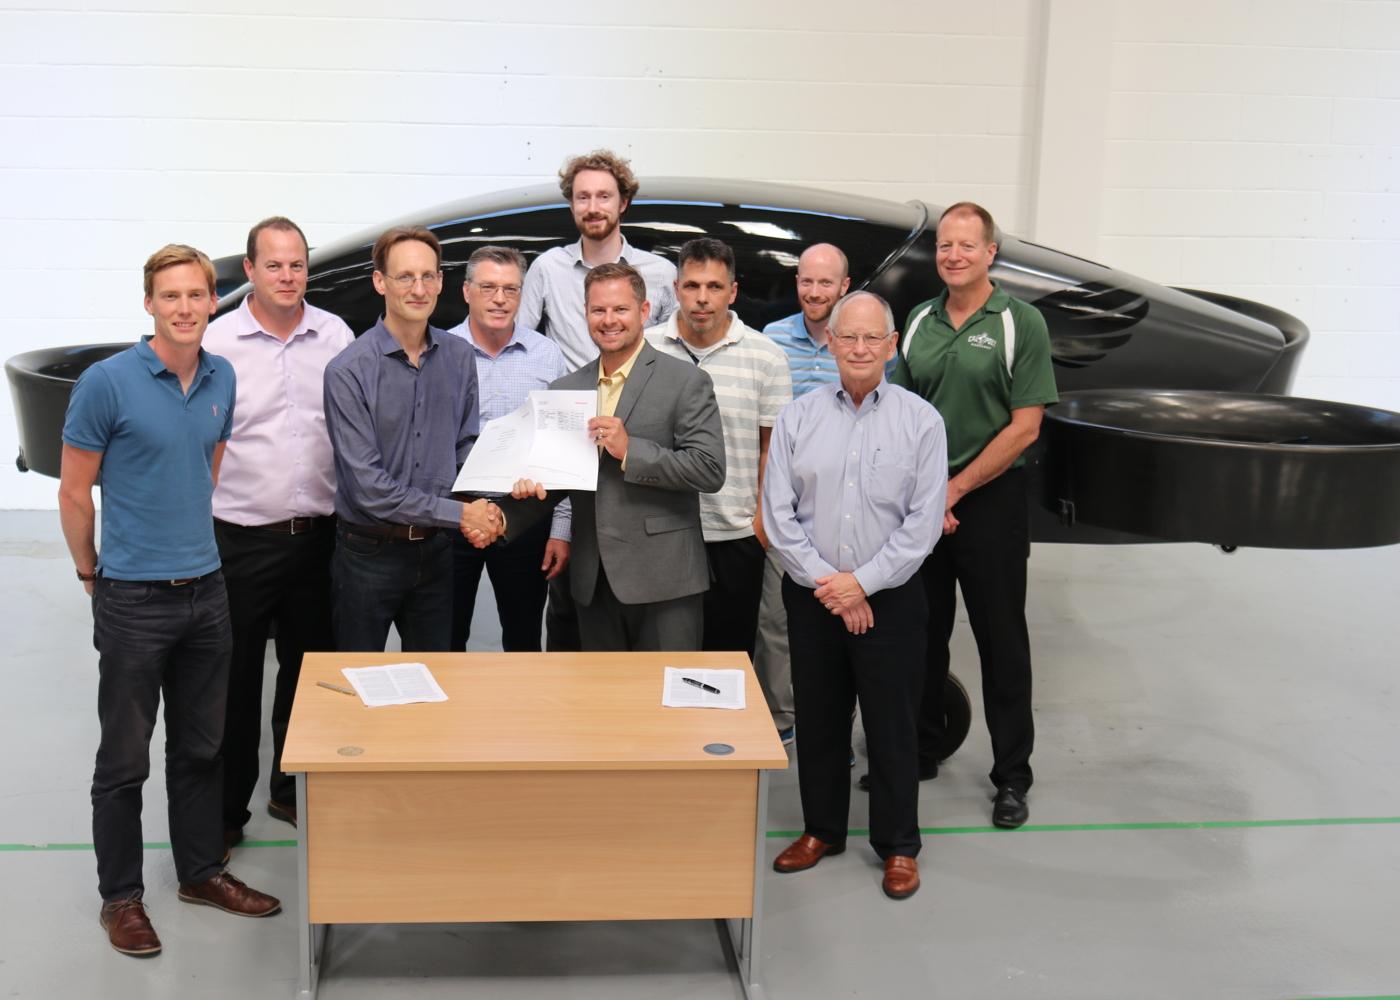 Honeywell and Vertical Aerospace sign partnership agreement